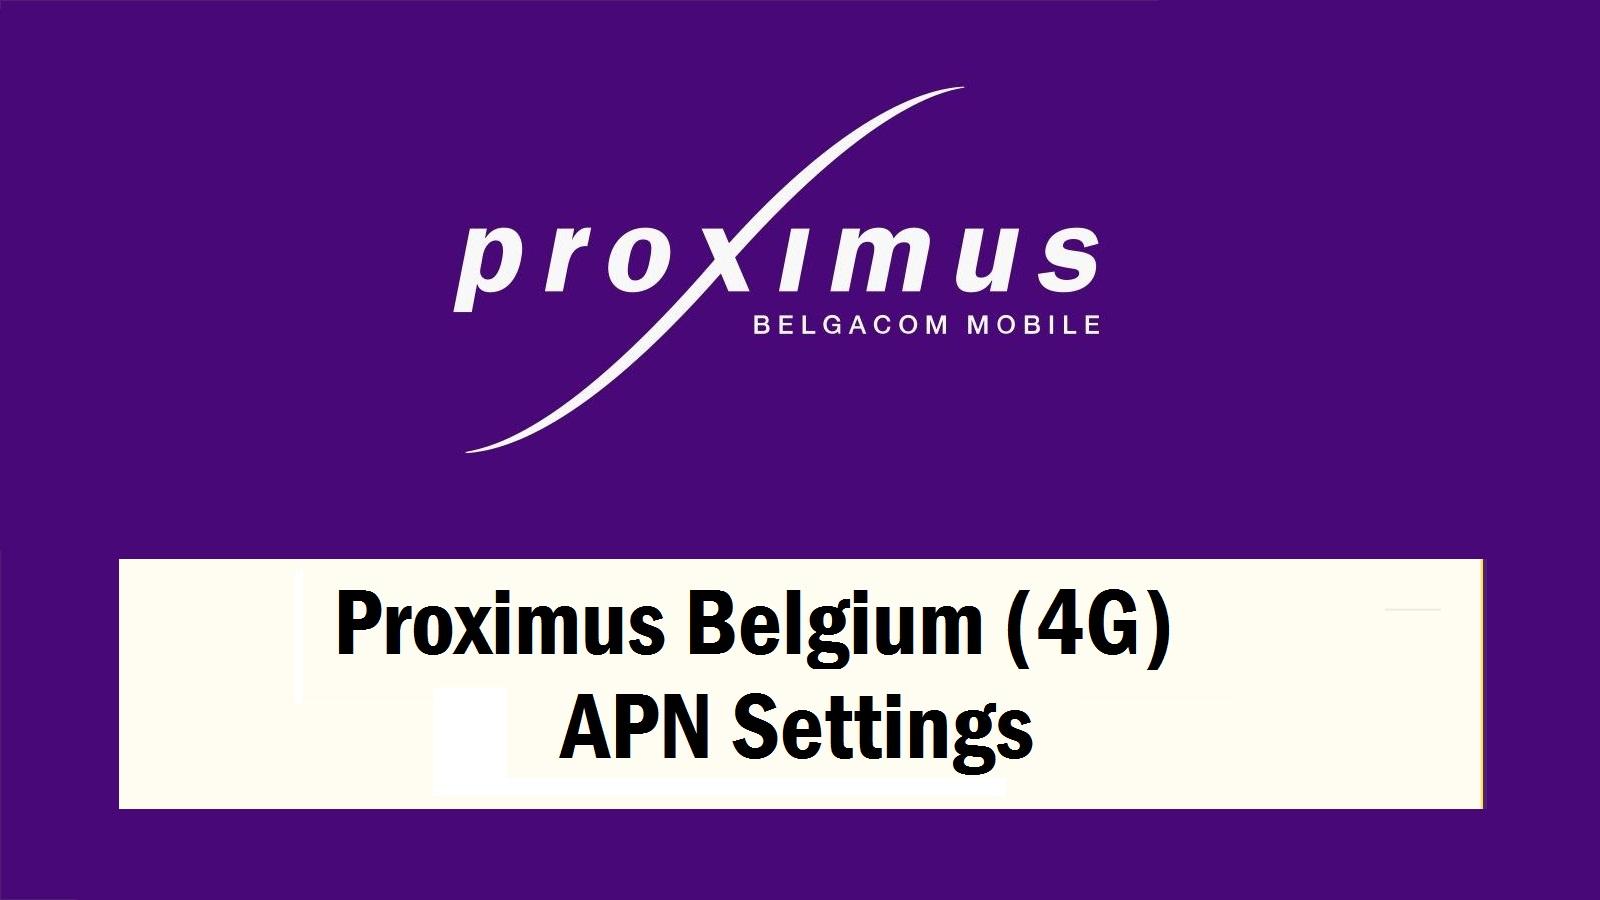 Proximus Belgium (4G) APN Settings